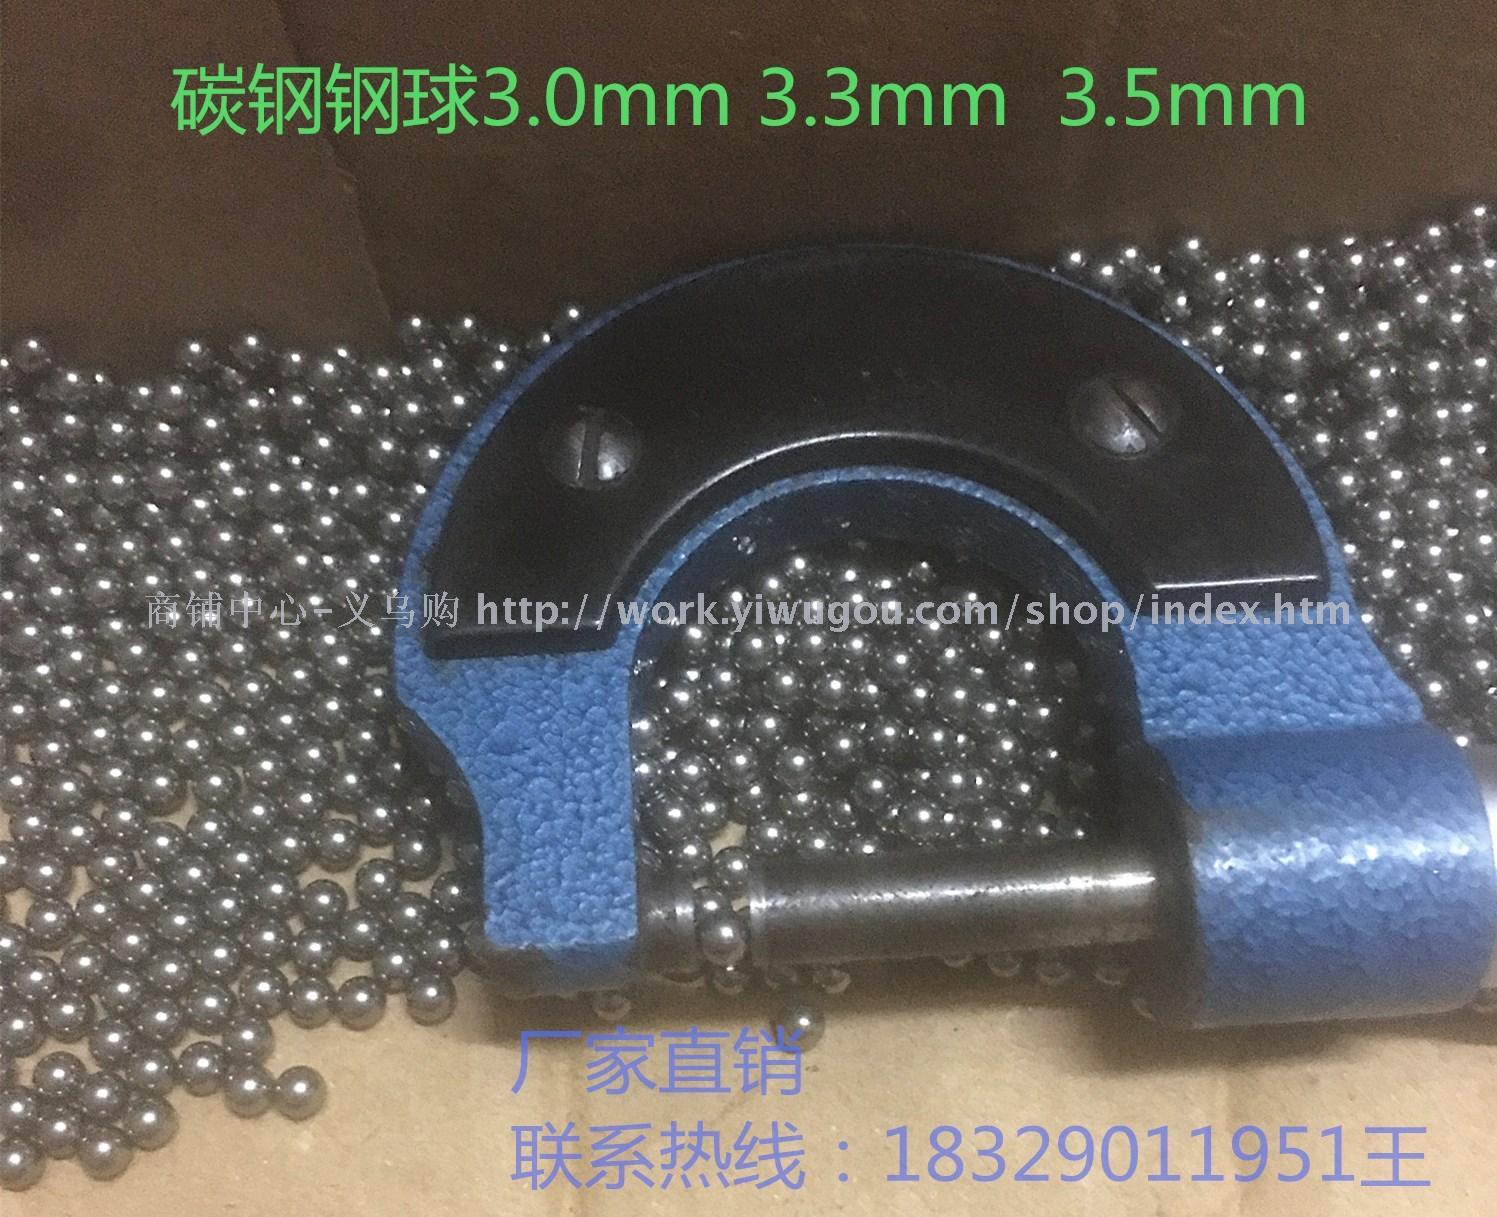 Supply Manufacturer direct sales carbon steel ball 3 3mm3